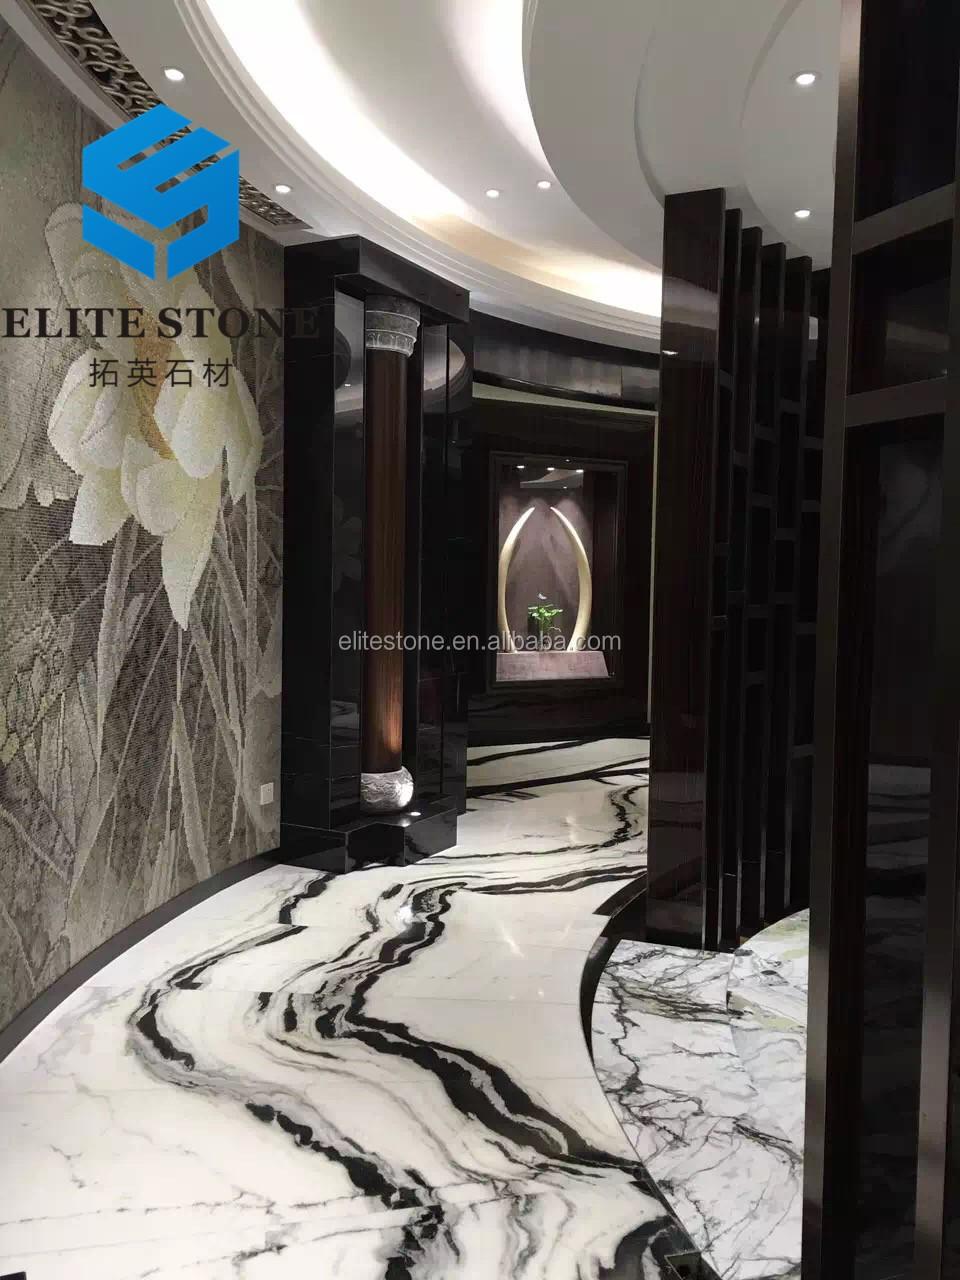 China Panda White Marble Price For Flooring Tiles And Wall Tiles DesignPanda White Marble With